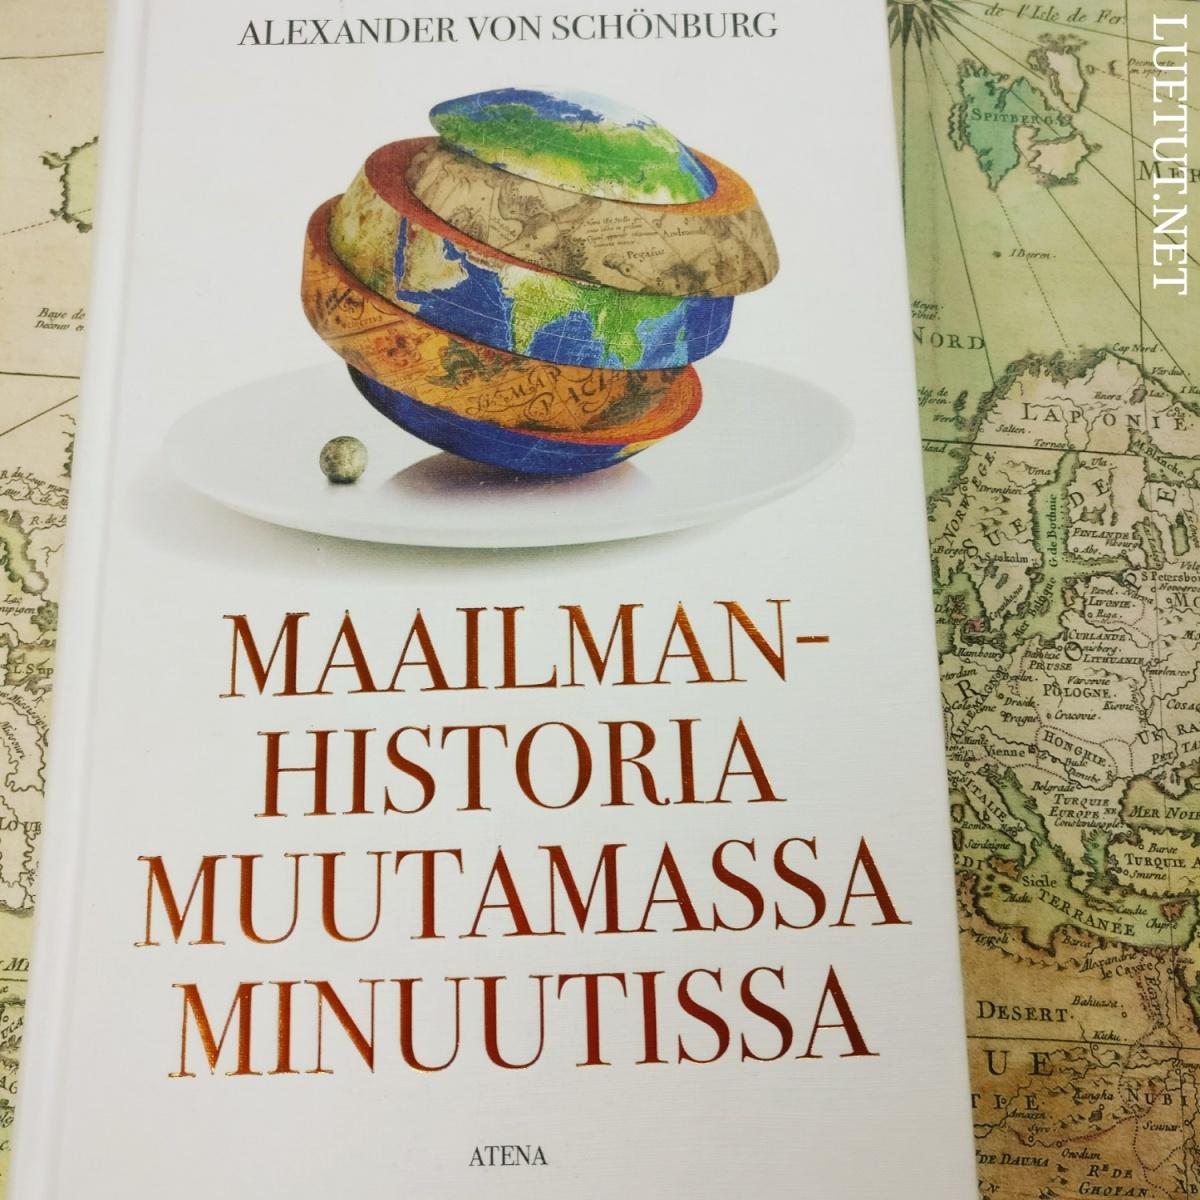 Alexander von Schönburg: Maailmanhistoria muutamassa minuutissa